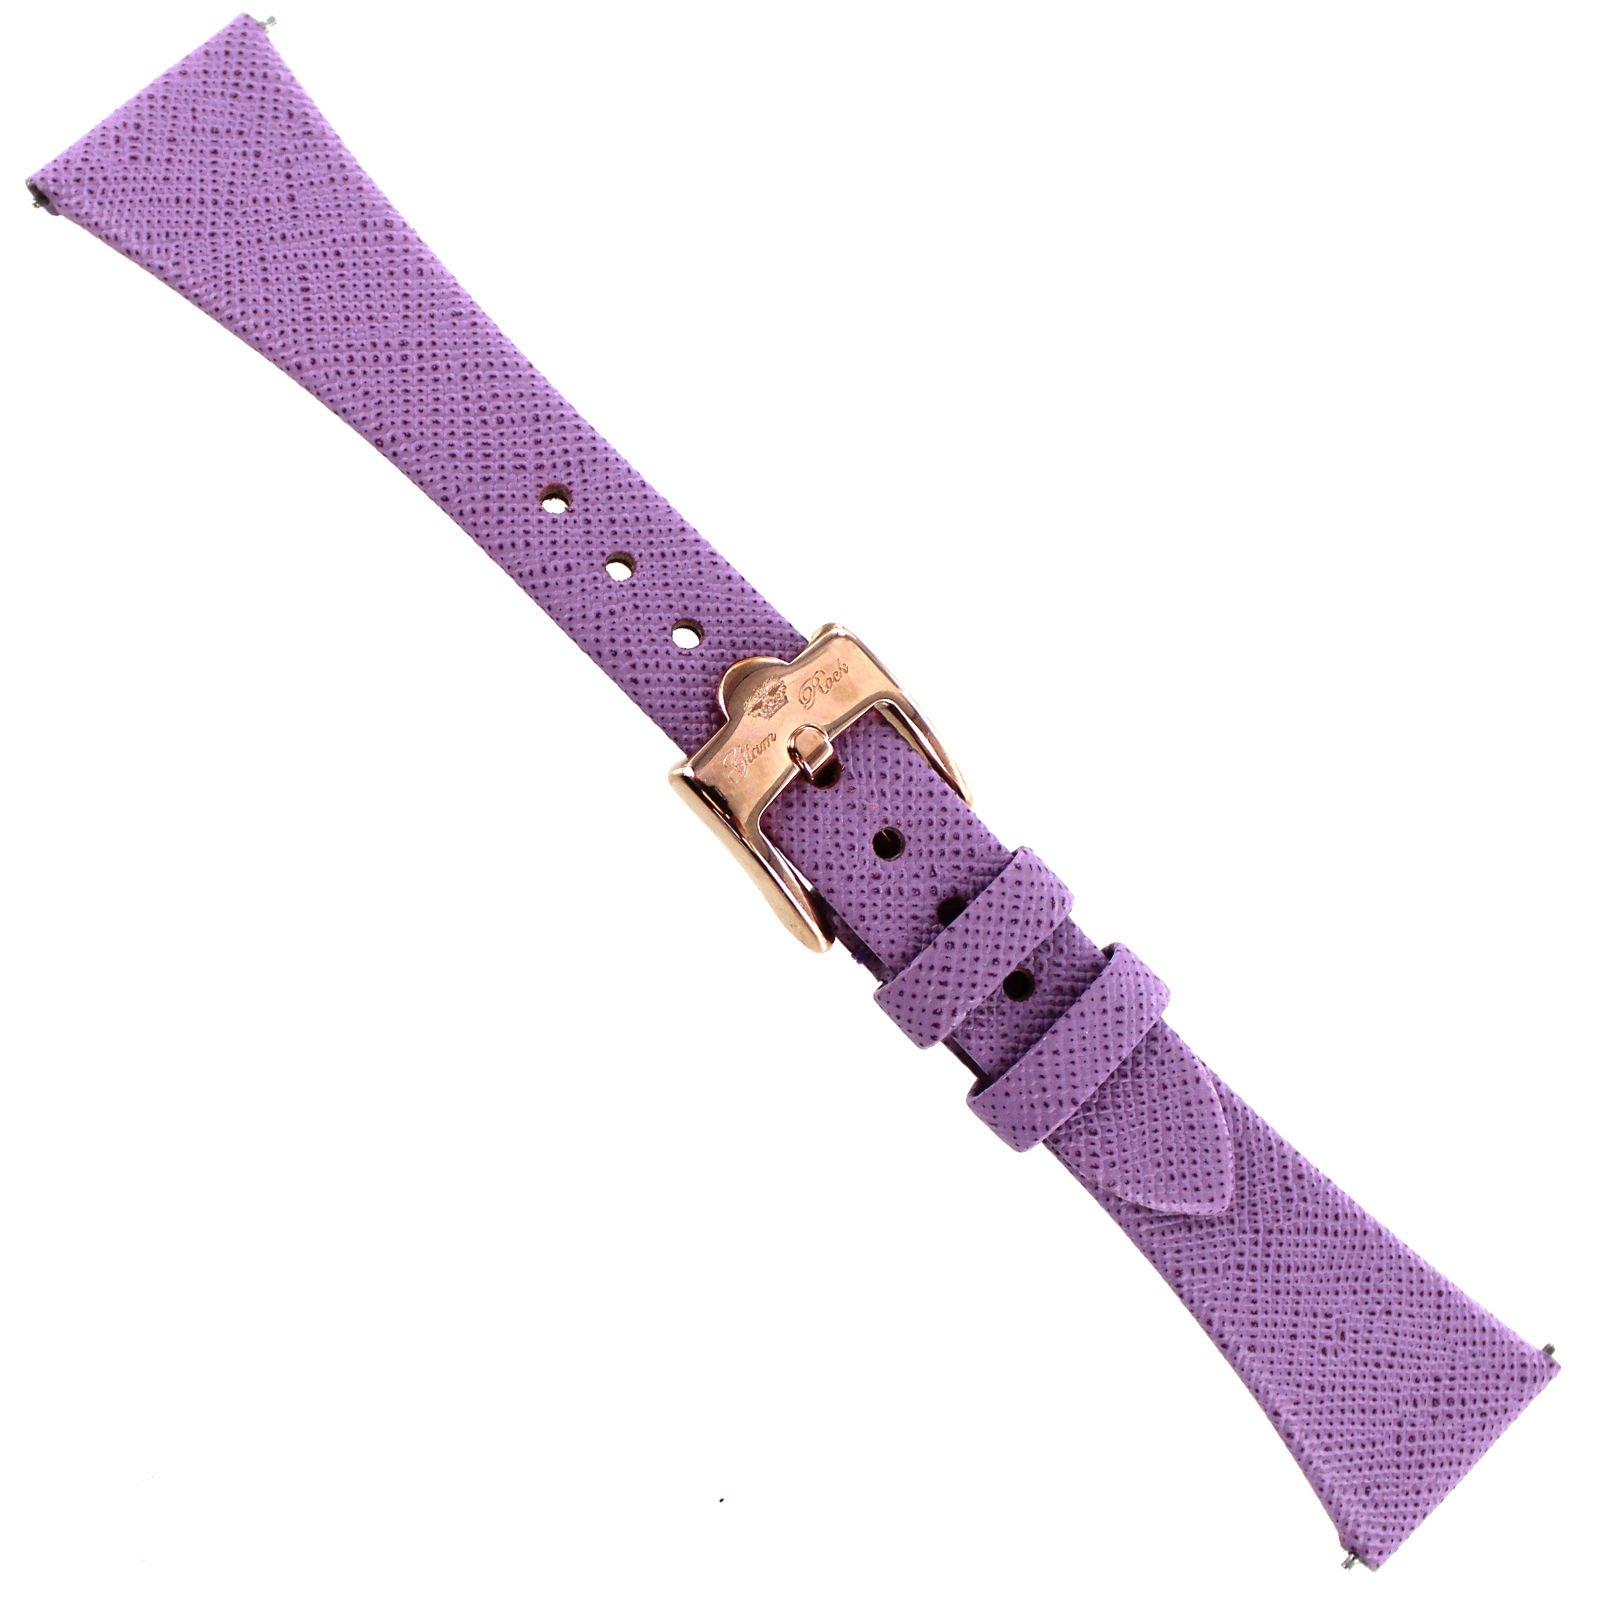 20mm Glam Rock Lavender Saffiano Genuine Leather Unstitched Watch Band EZ PINS